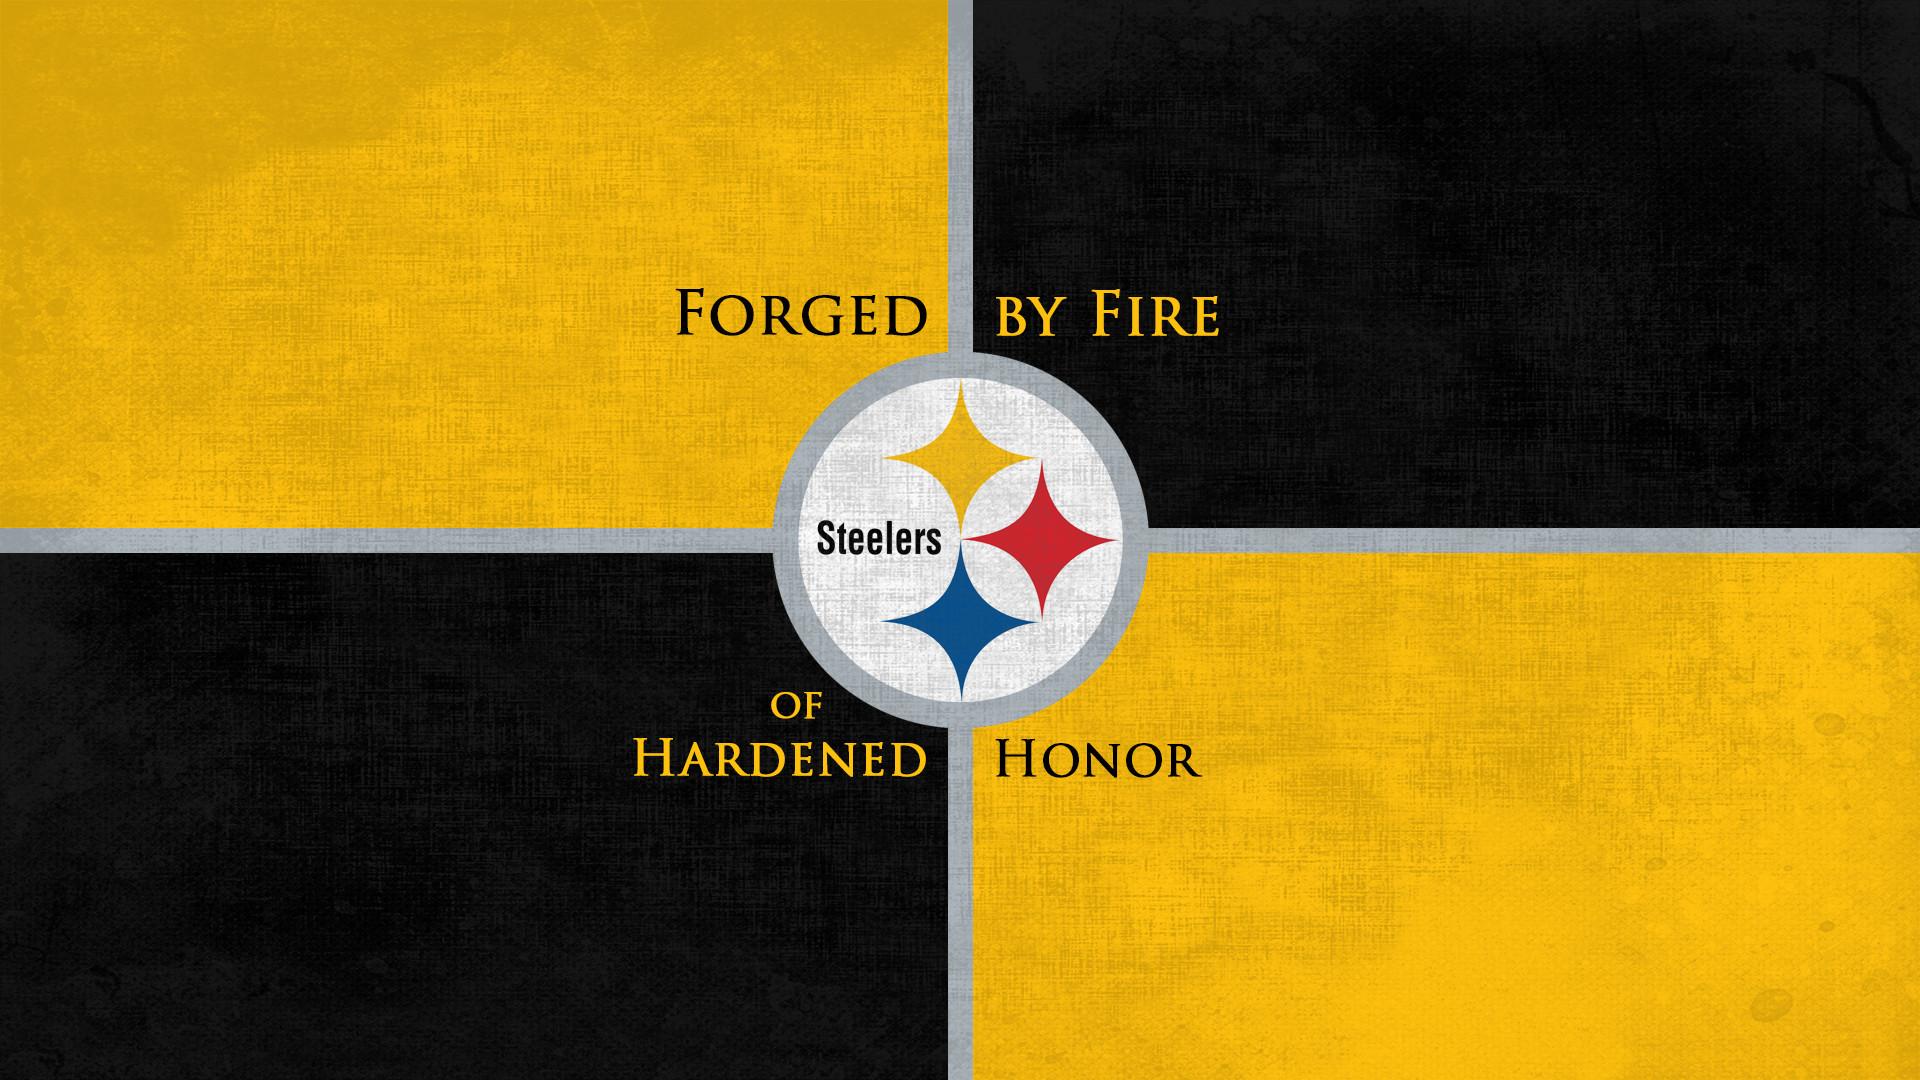 Pittsburgh Steelers Wallpapers for Computer Desktop.